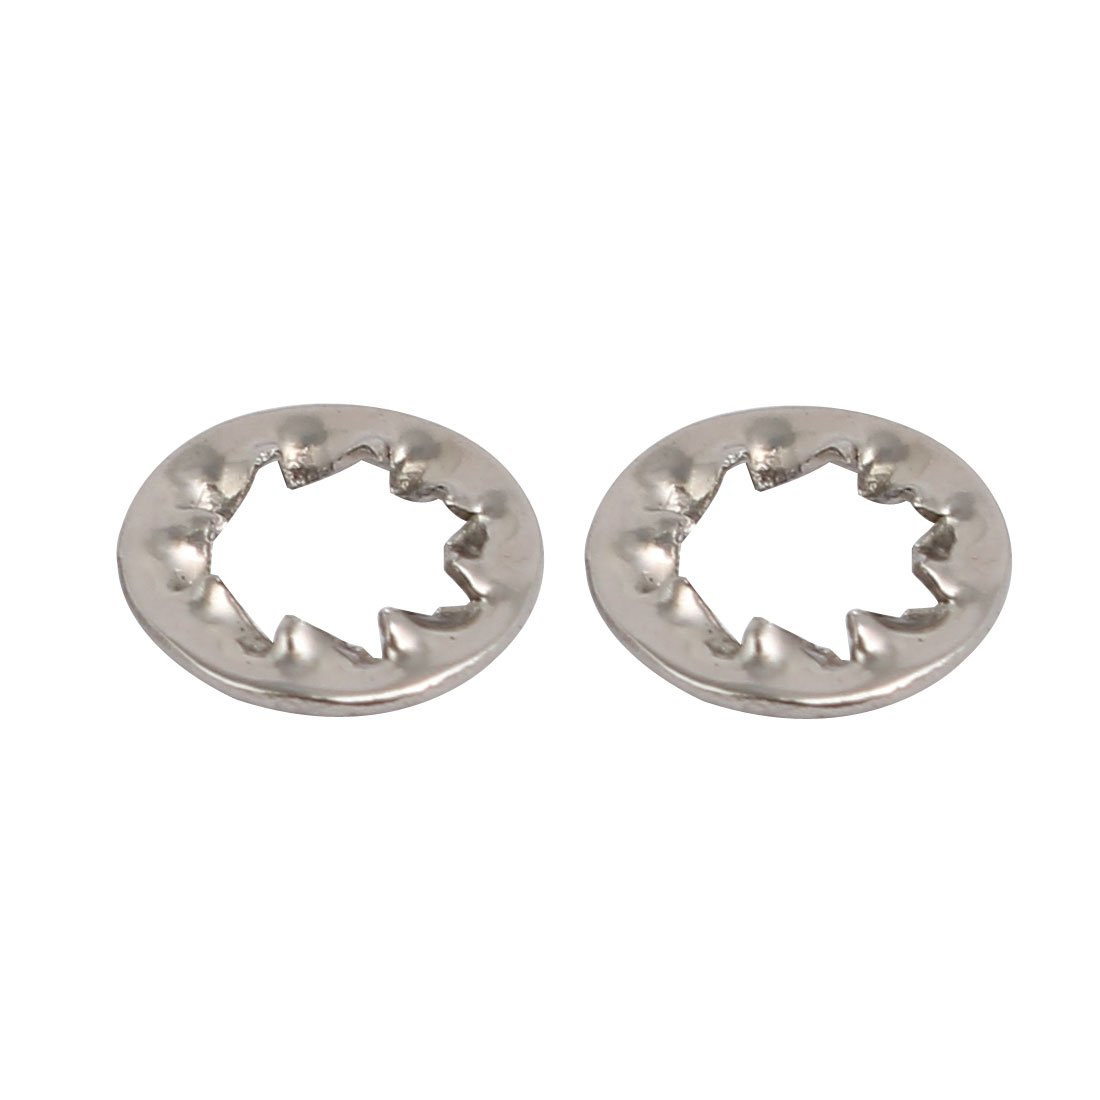 sourcingmap 4mm de di/ámetro interior Arandea dentada interna de acero inoxidable 304 gris 50pcs